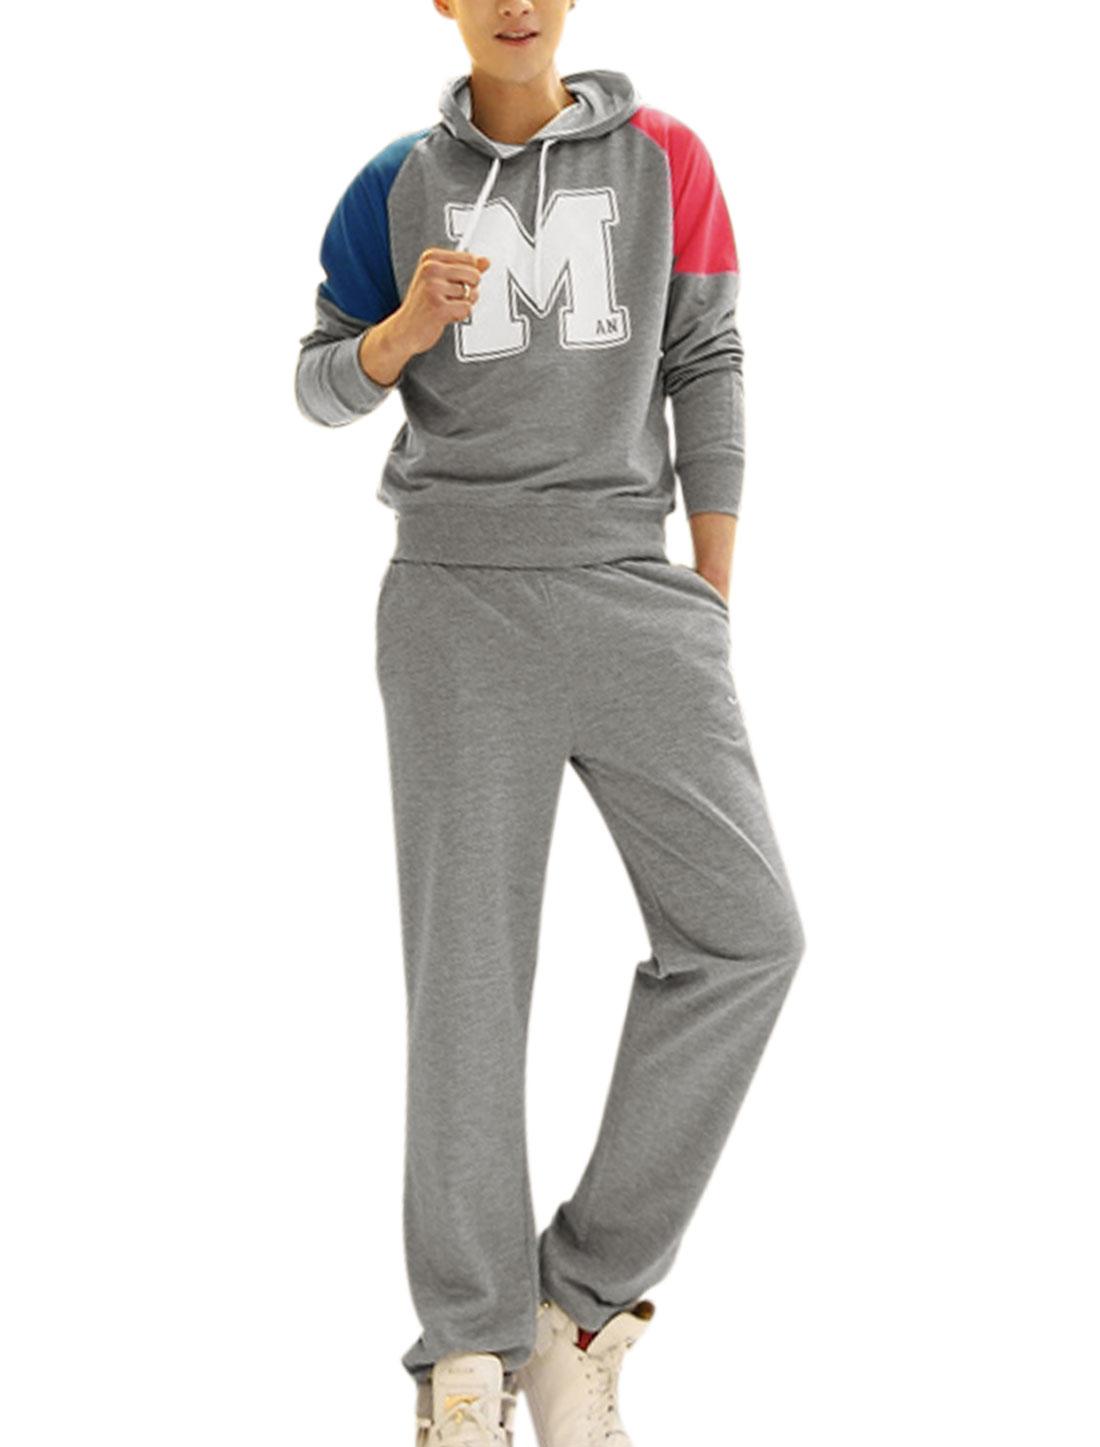 Man Long Sleeve Letter Print Panel Hoodie Sweatshirt w Elastic Waist Slant Pockets Pants Gray S